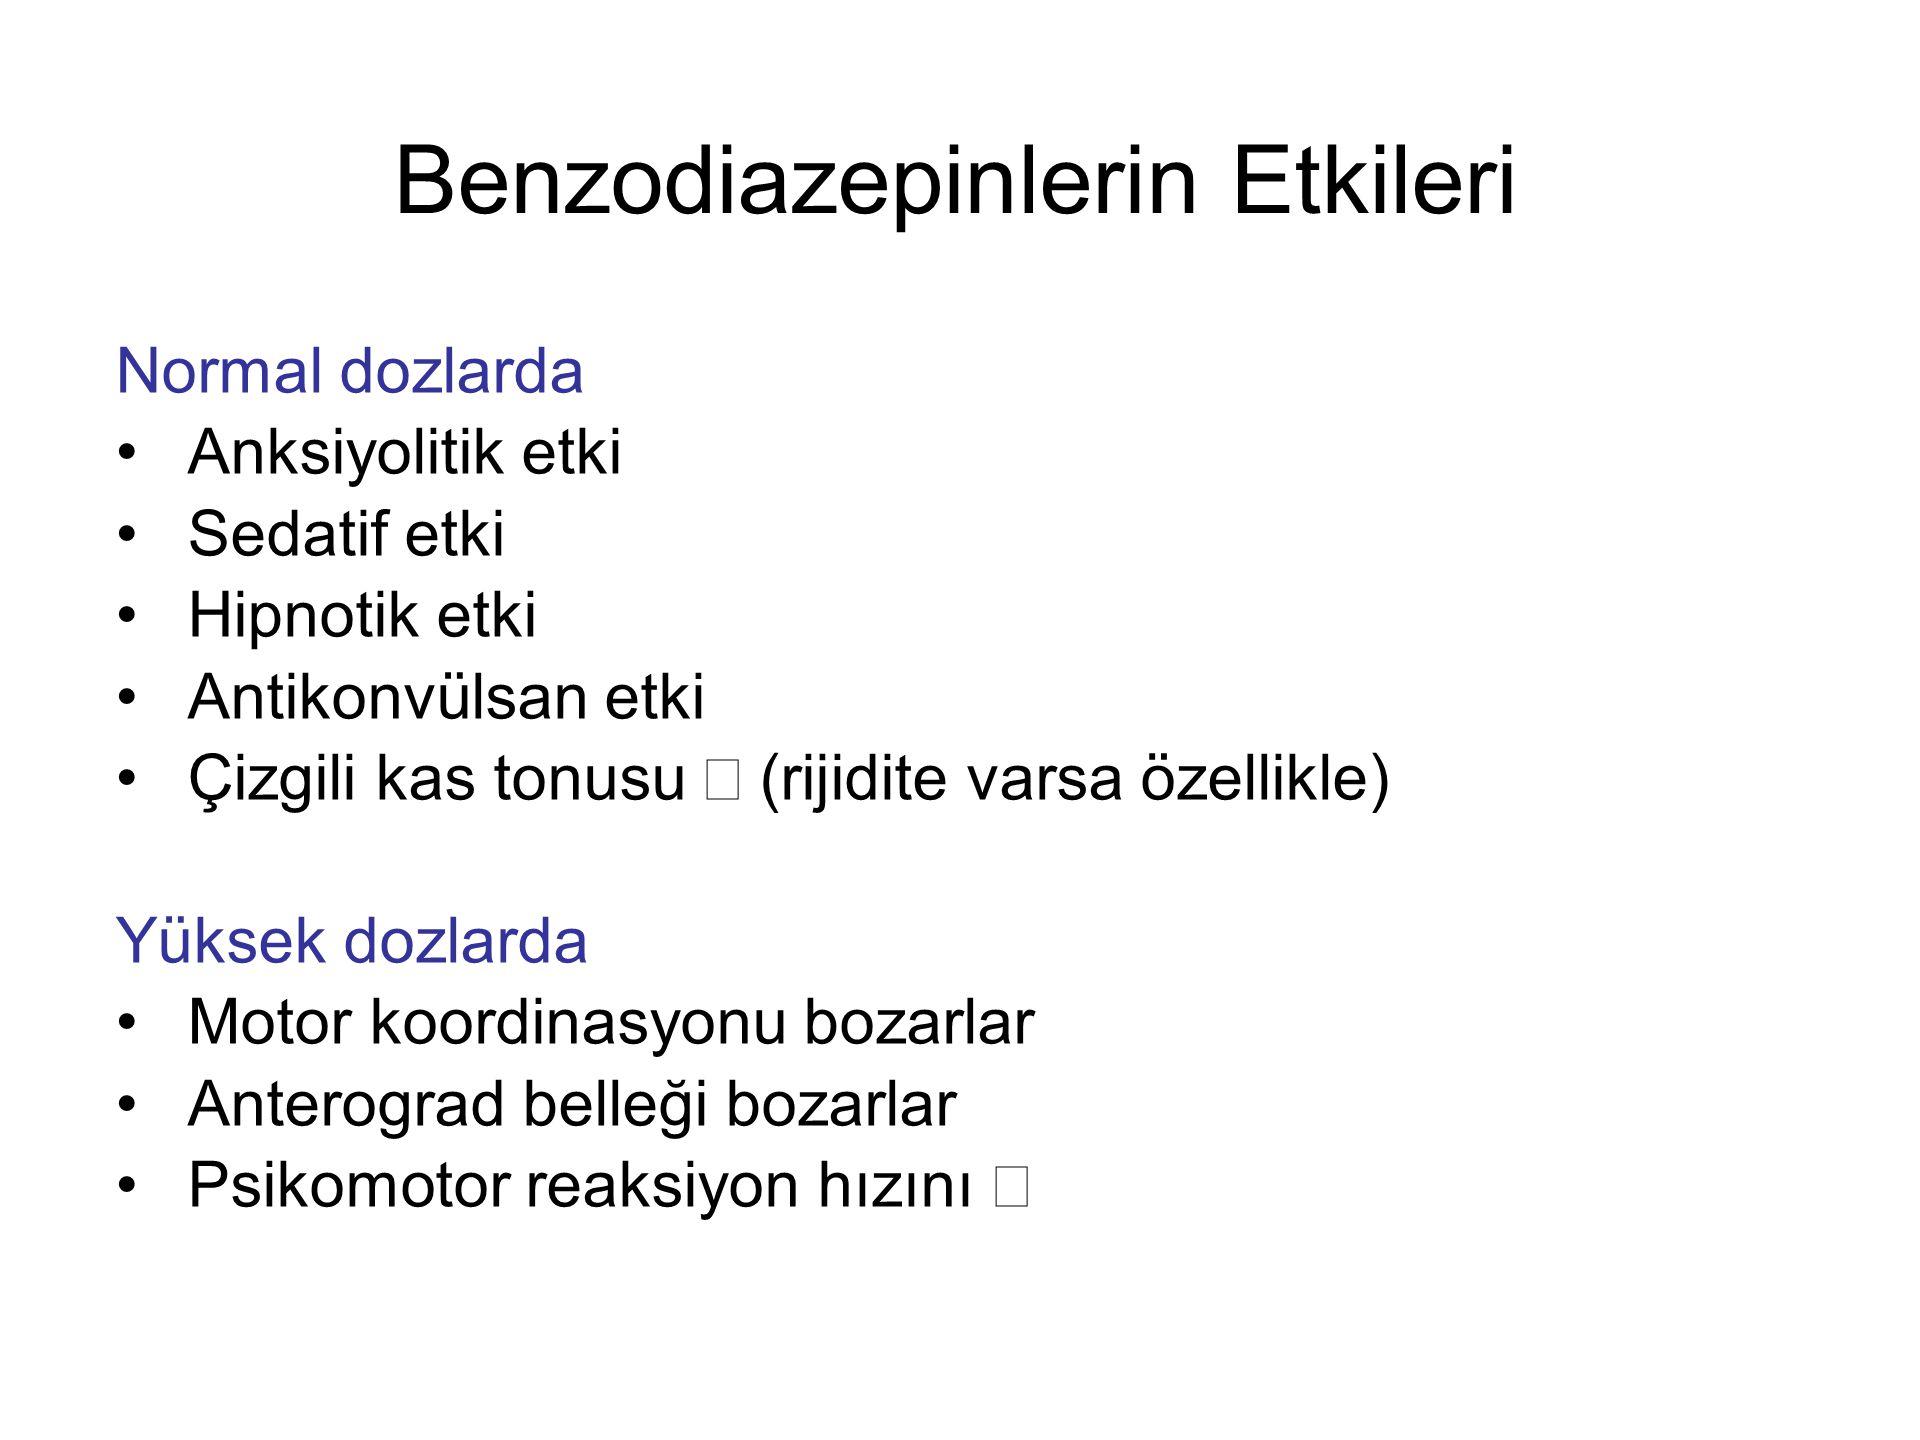 Benzodiazepin Preparatları Diazepam DİAZEM 2 mg, 5 mg ve 10 mg, 25 kapsül 10 mg, 10 ampul DİAPAM 10 mg/2ml, 10 ve 100 ampul LİZAN 2 mg ve 5 mg, 25 kapsül NERVİUM 5 mg, 50 tablet Alprazolam XANAX 0,5 ve 1 mg, 30 tablet Klordiazepoksit LİBKOL 5 mg, 50 kapsül LİBRAX 5 mg, 40 ve 100 draje KLİPAKS 5 mg, 40 ve 100 draje Klorazepat ANKSEN 5 mg ve 10 mg, 30 kapsül TRANXİLENE 5 mg ve 10 mg, 30 kapsül Lorazepam ATİVAN EXPİDET 1 ve 2.5 mg, 20 tablet